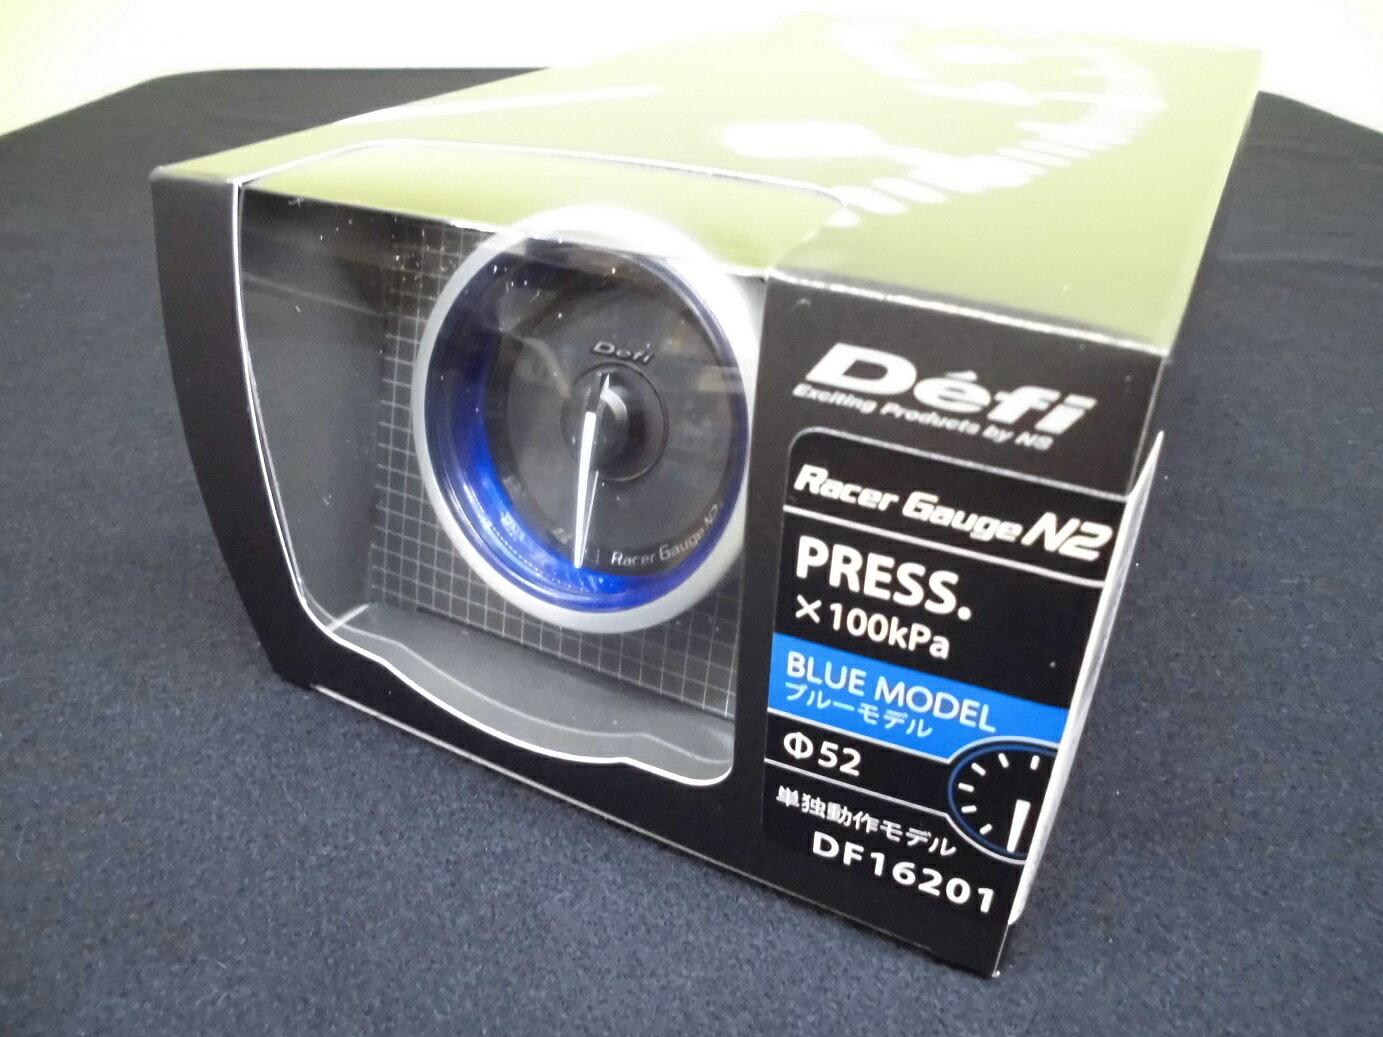 Defi Racer Gauge N2 デフィ レーサーゲージ 52Φ 圧力計 (油圧計などに) DF16201 「送料無料!!」